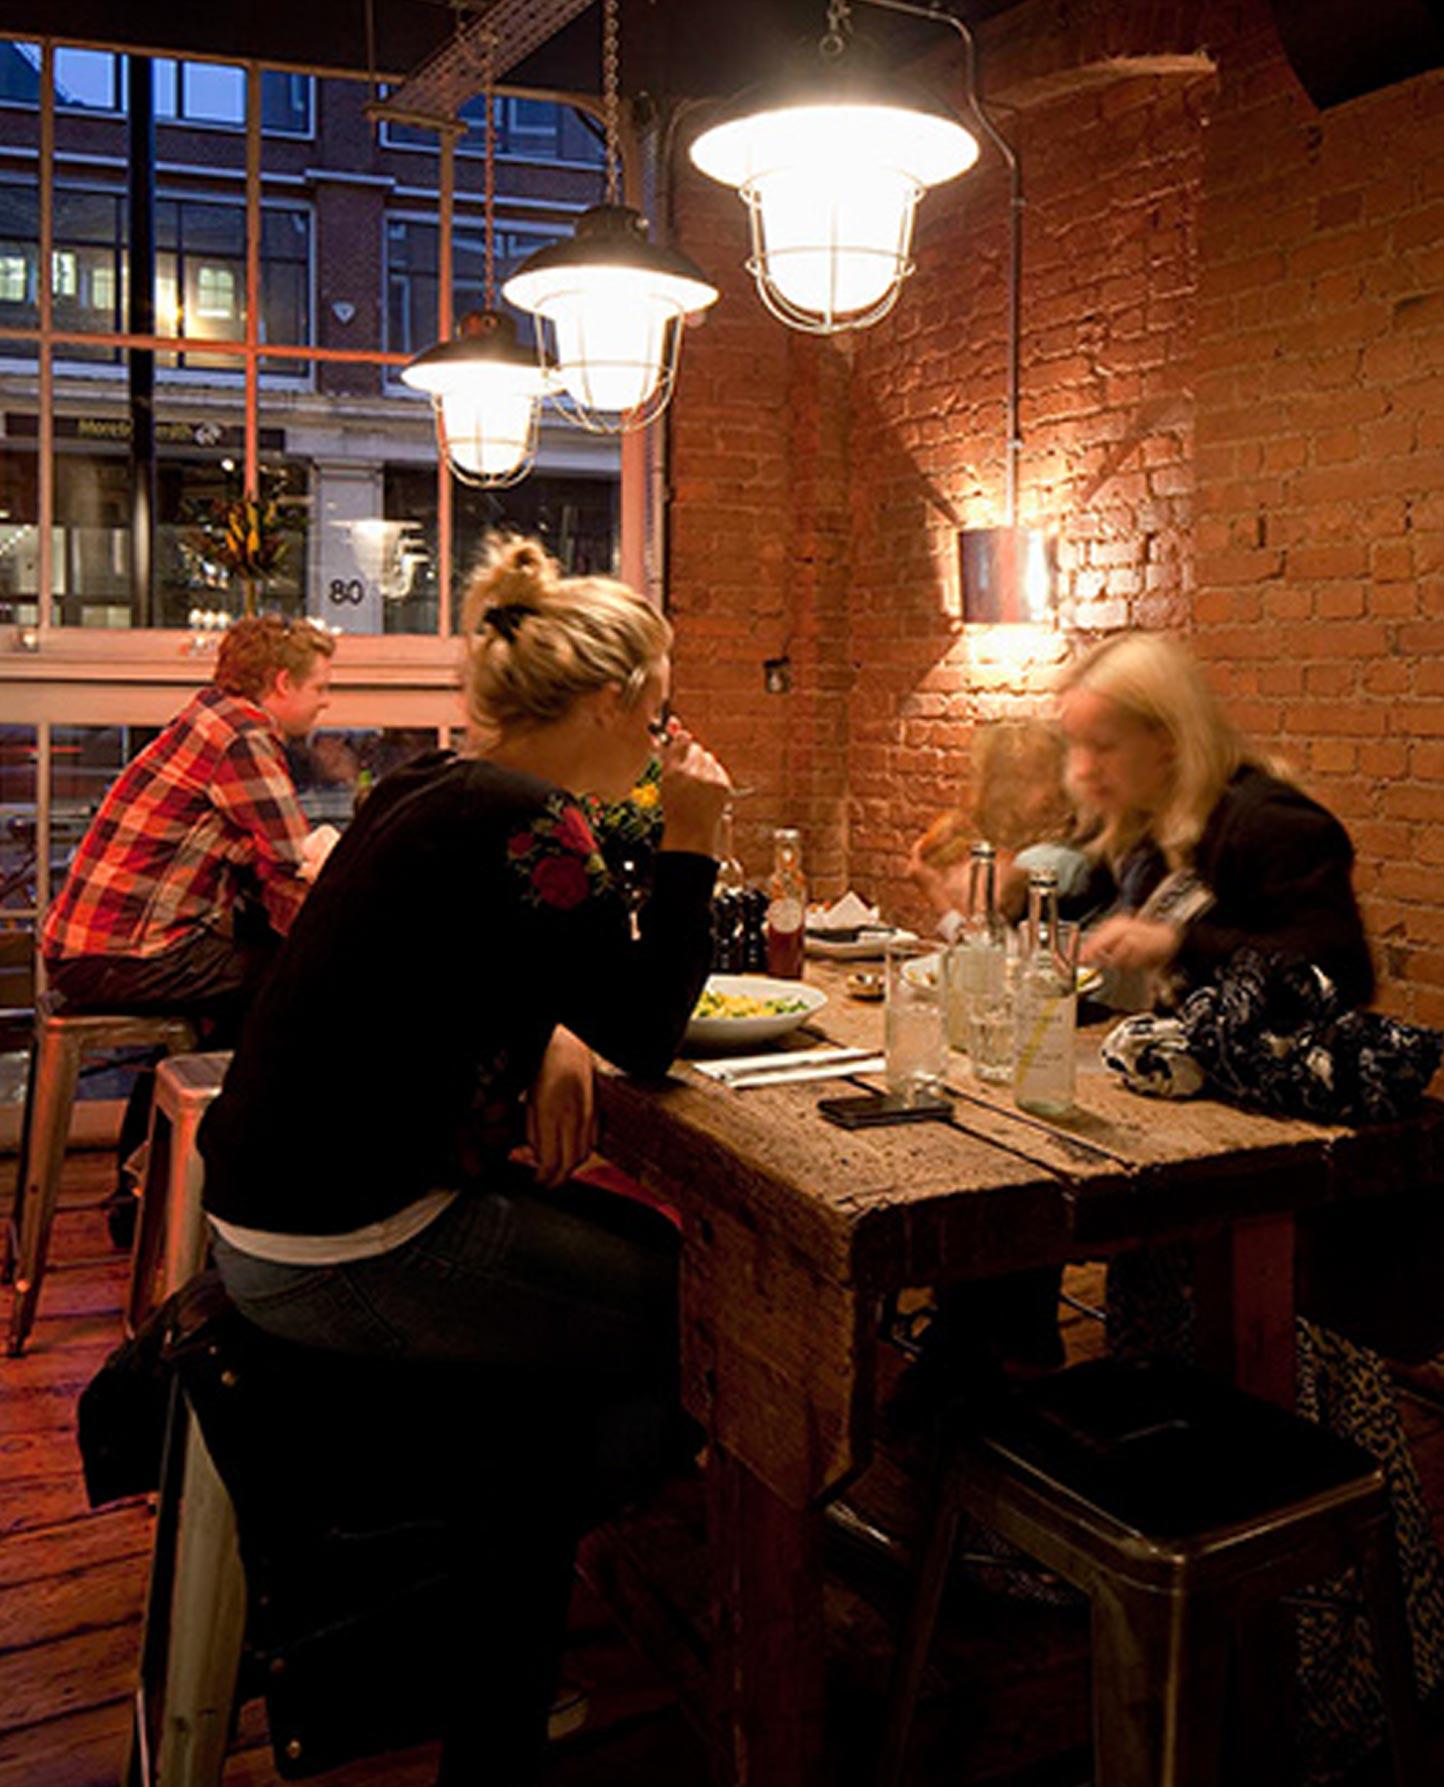 Steel Wall Light Dining Intimate Industrial Interior Brickwork Nulty Bespoke